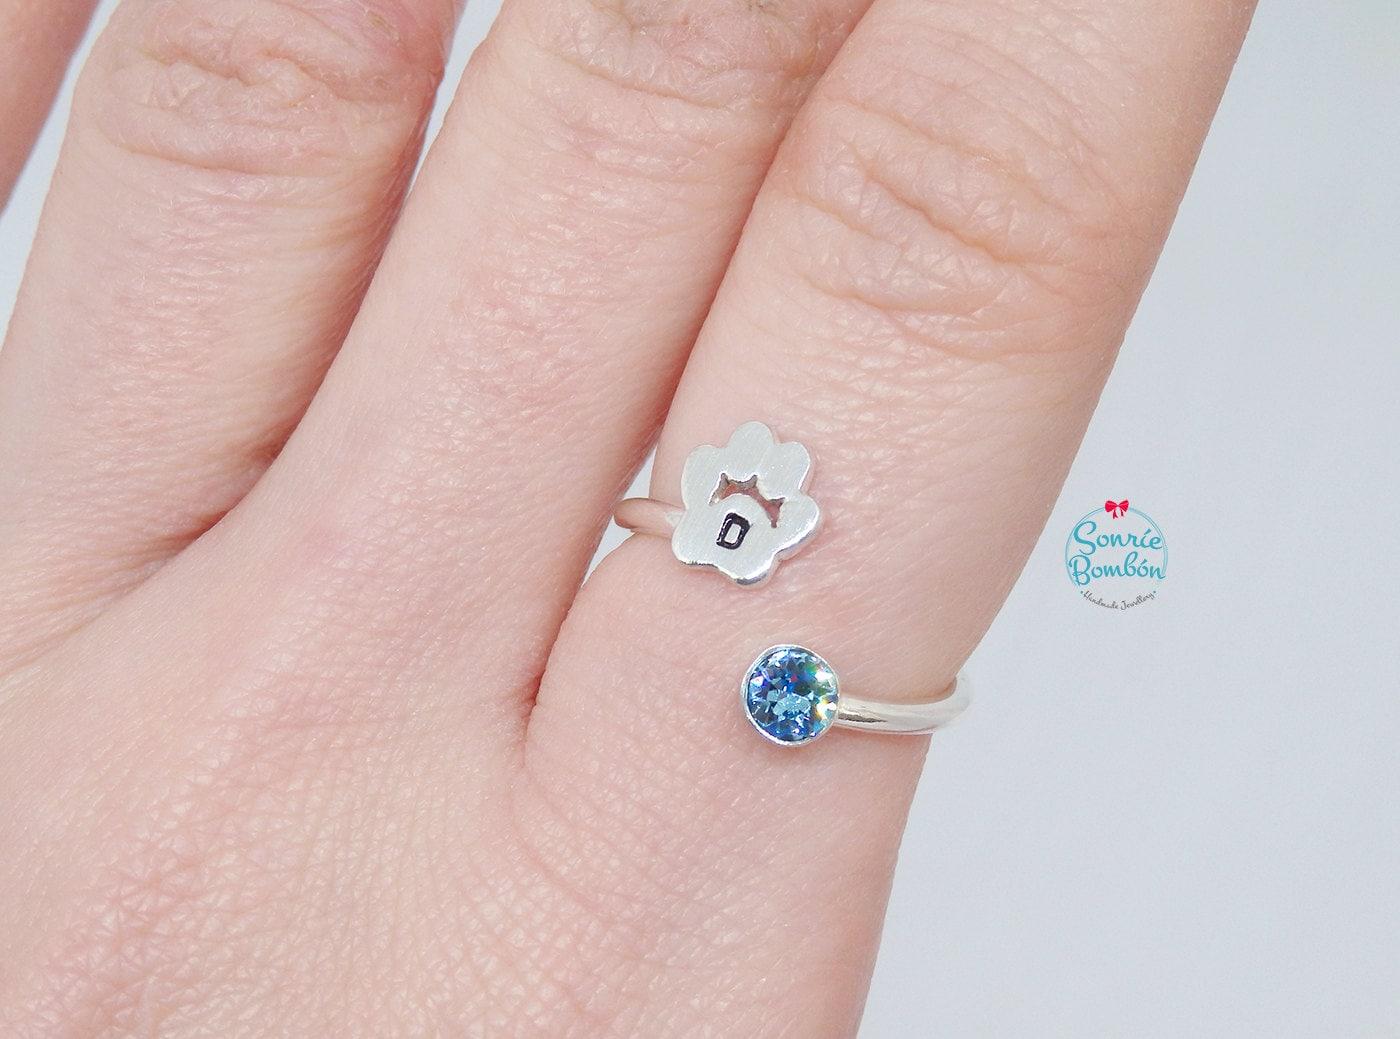 Dog paw ring / Dog paw initial ring silver / Silver ring Dog